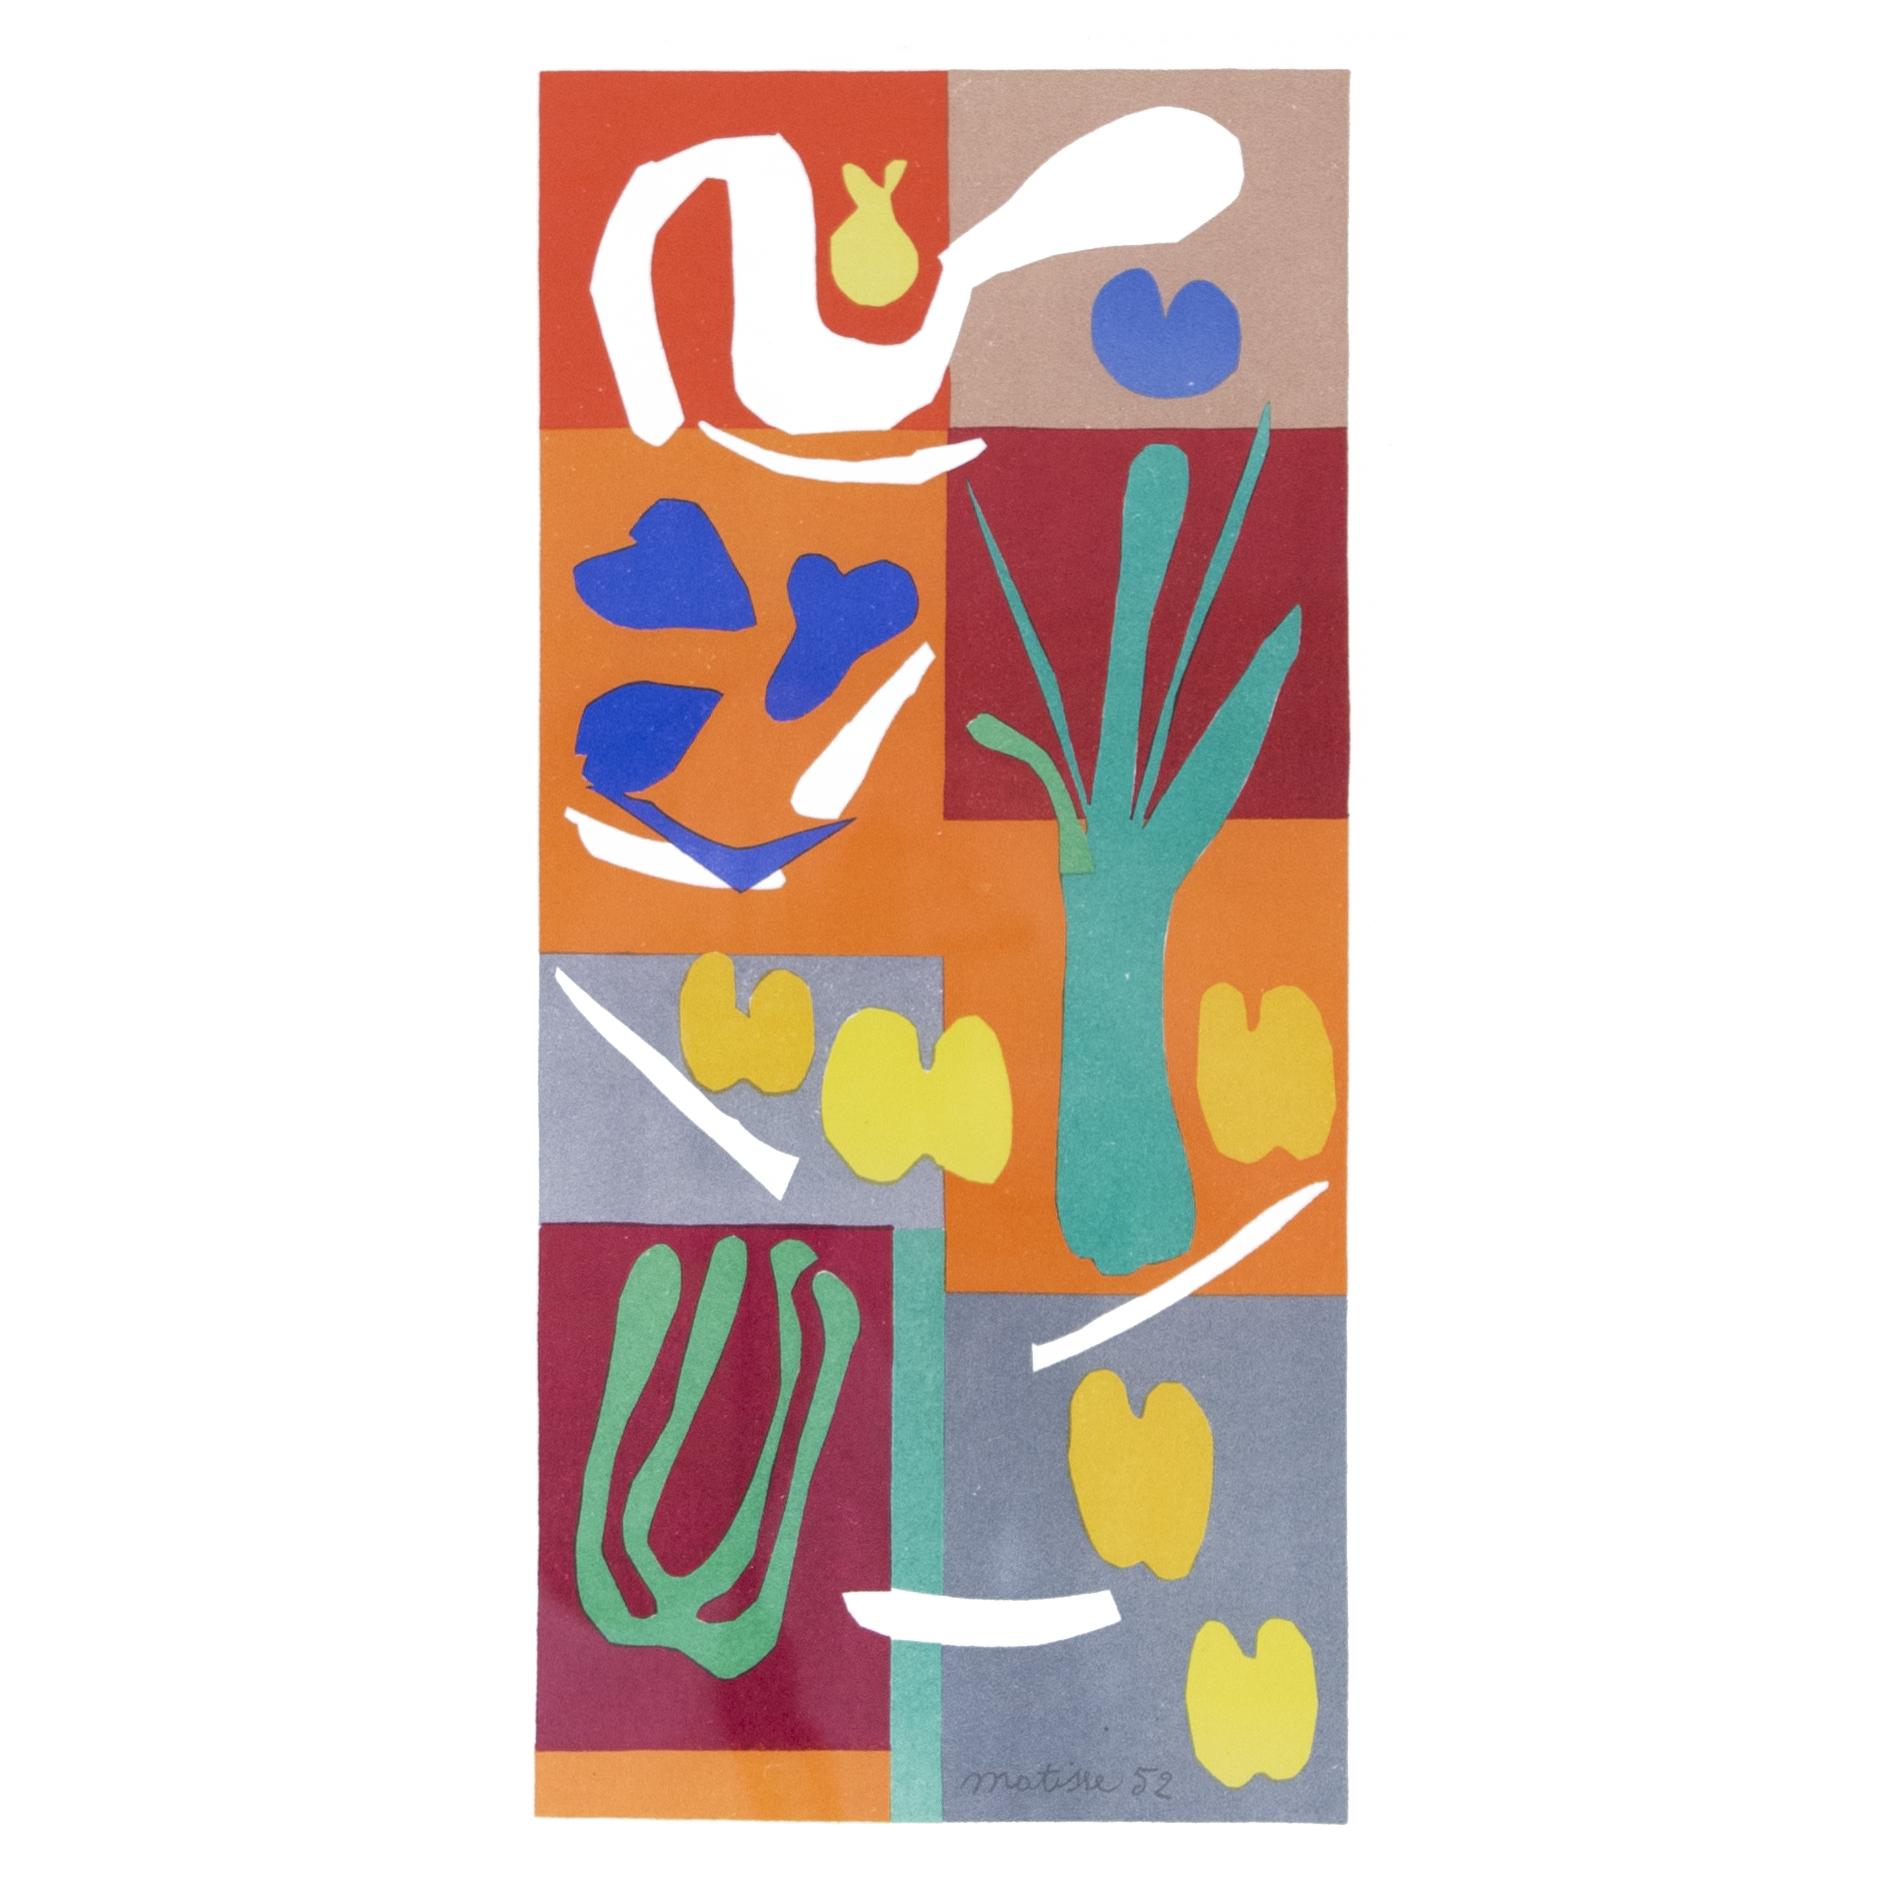 henri-matisse-lithograph-Vegetables-Végéteaux-the-cut-outs-1952-art-group-projects-no-frame.jpg